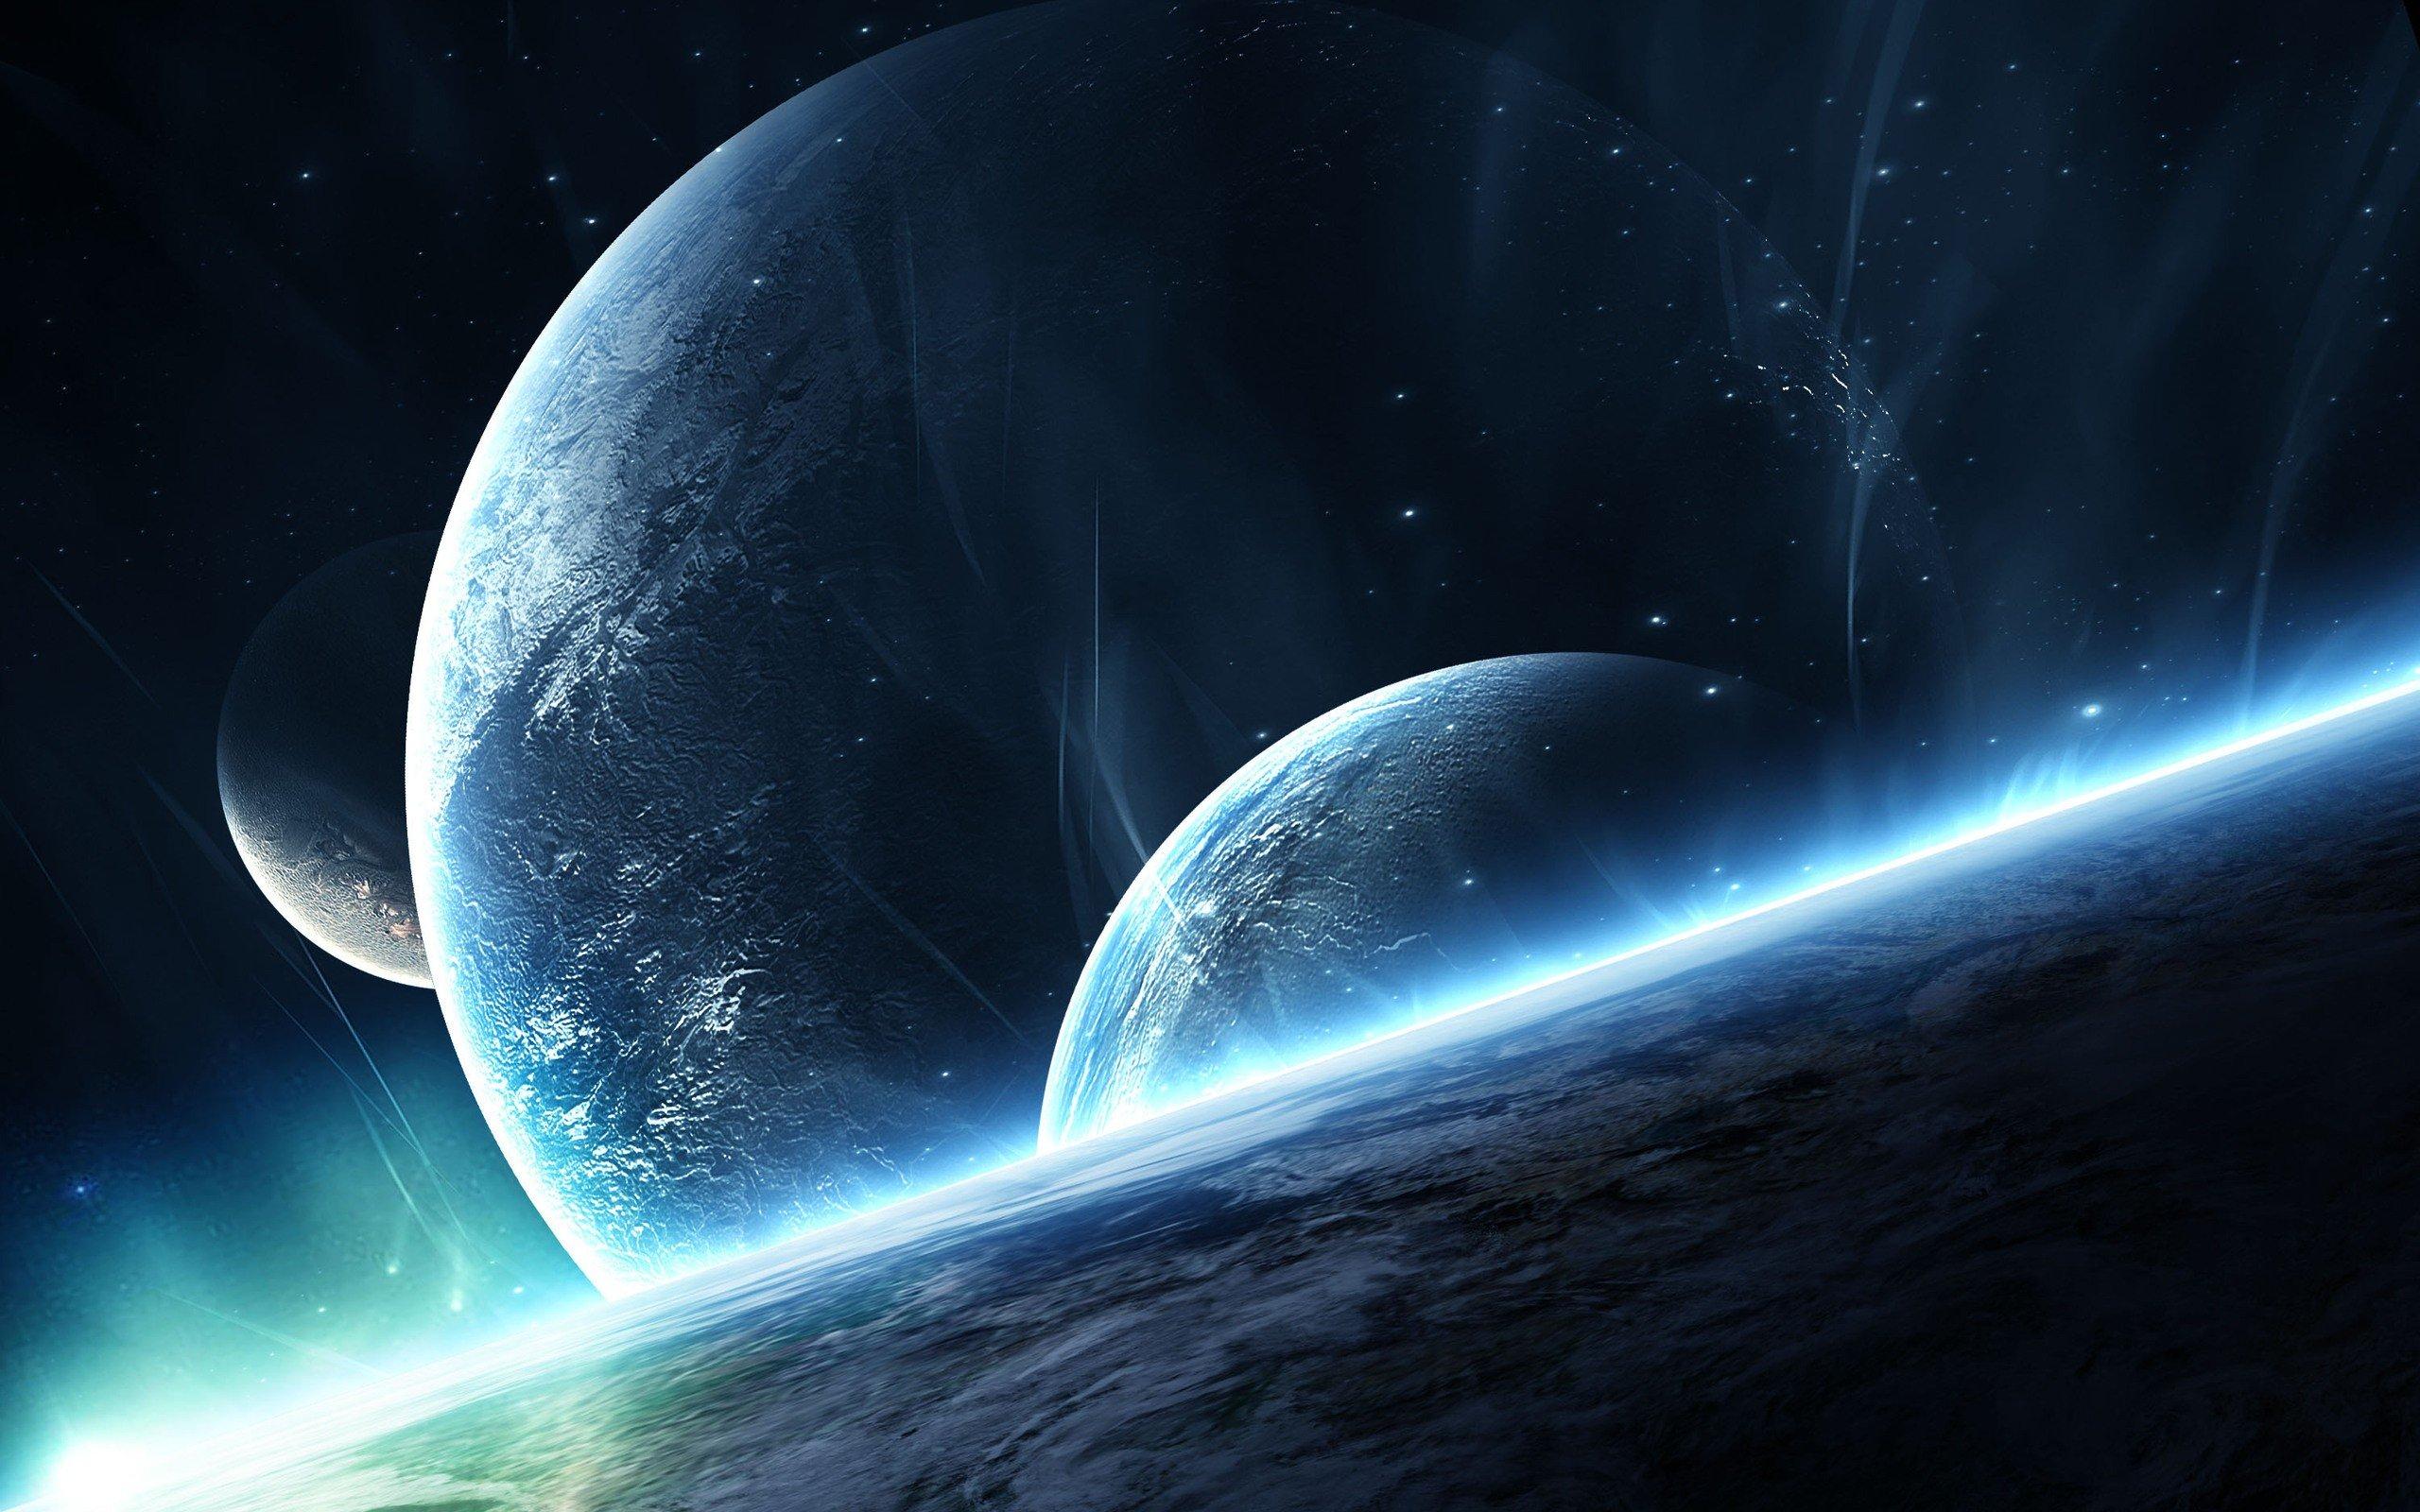 space wallpaper 5 2560x1600